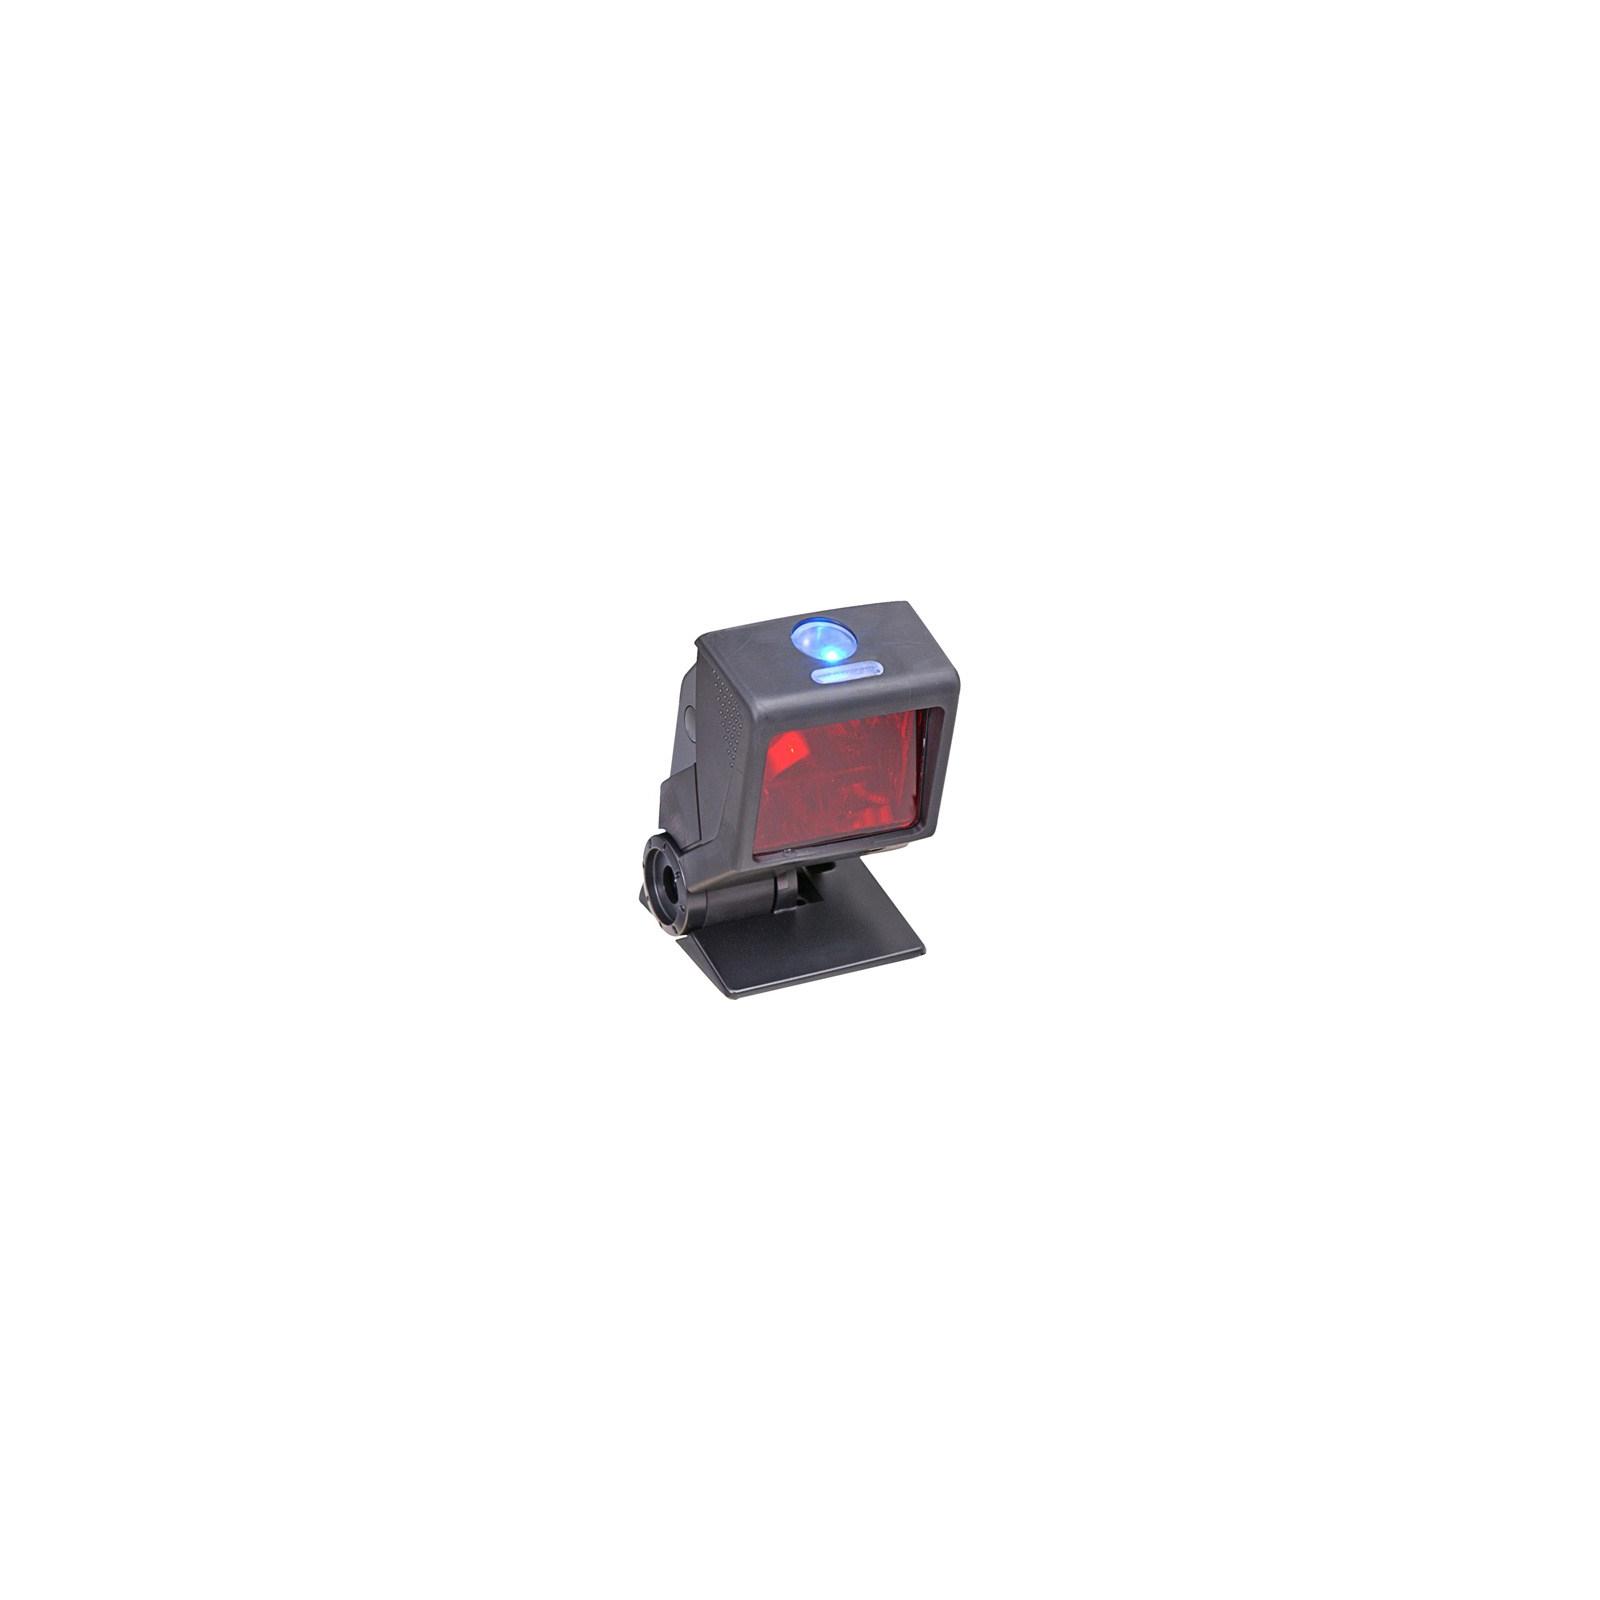 Сканер штрих-кода Honeywell MК-3580 QUANTUM (MK3580-31A38)